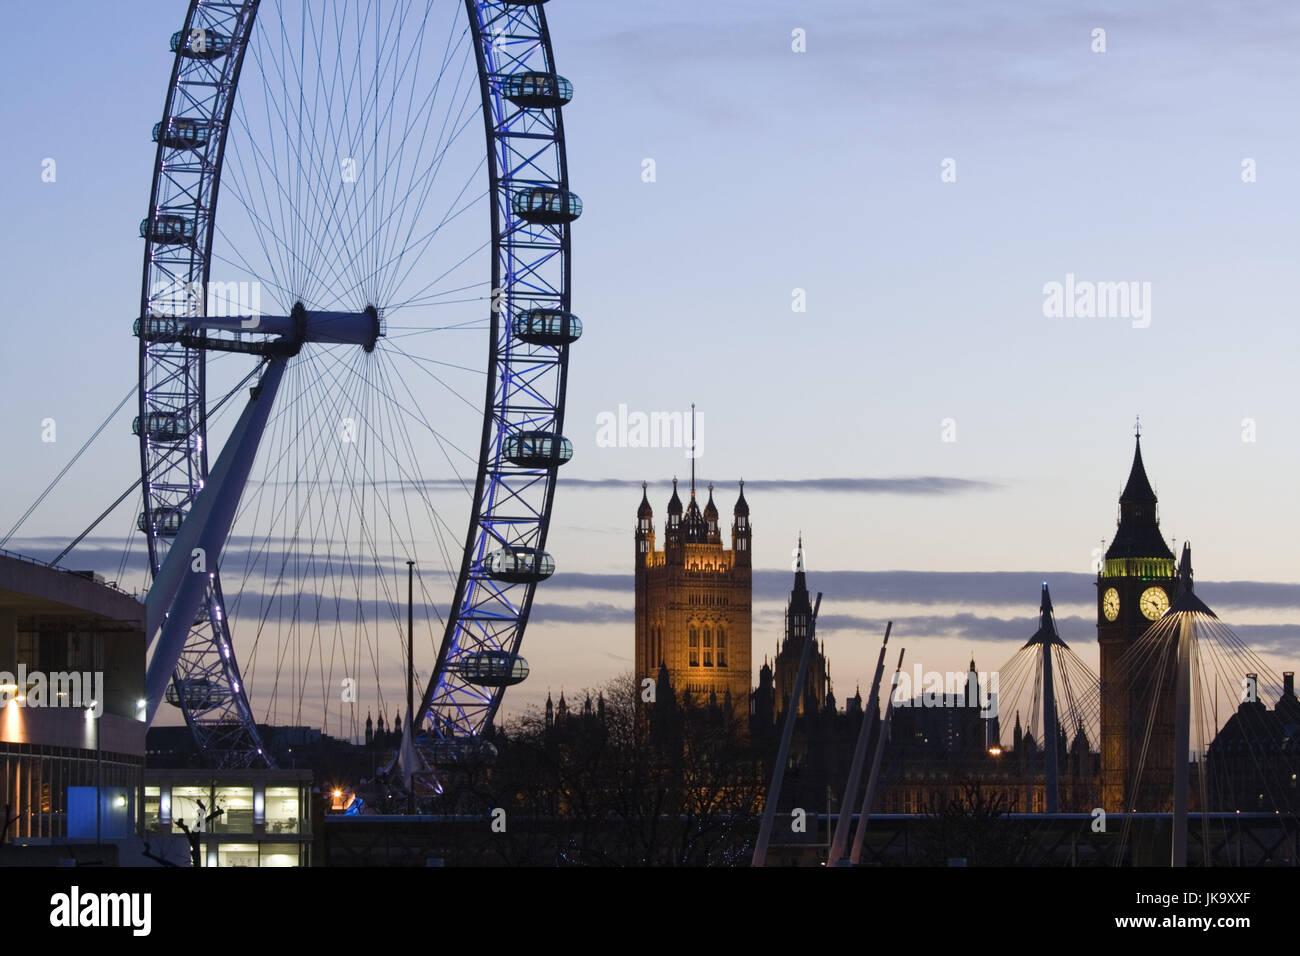 Großbritannien, England, London,  Stadtansicht, Houses of Parliament, London  Eye, Big Ben, Beleuchtung, Abend, - Stock Image